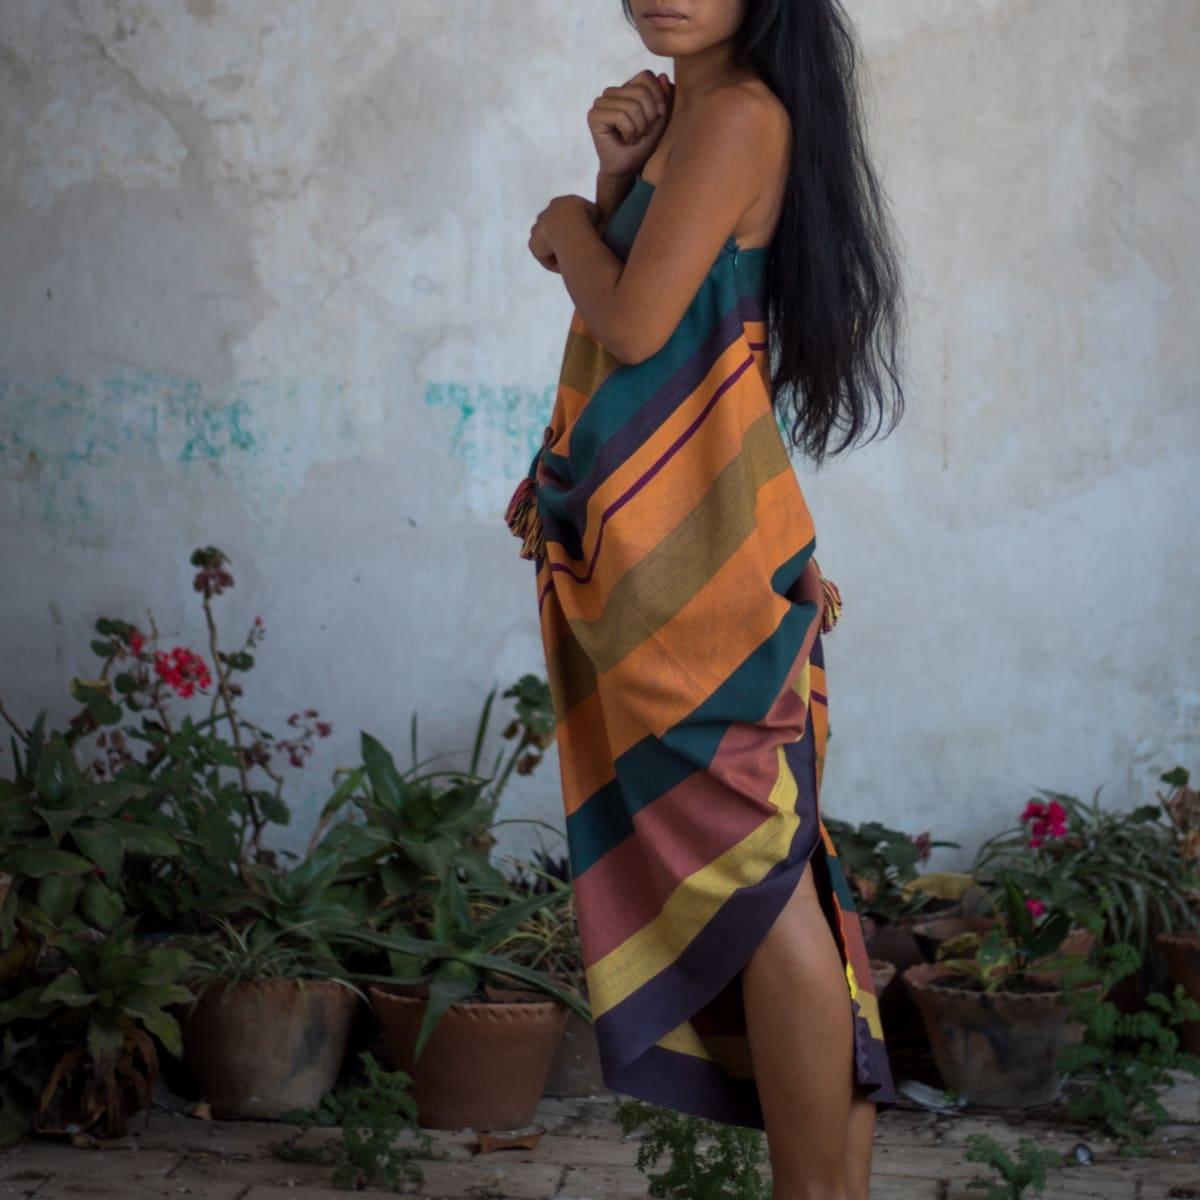 Torcida Skirt 3